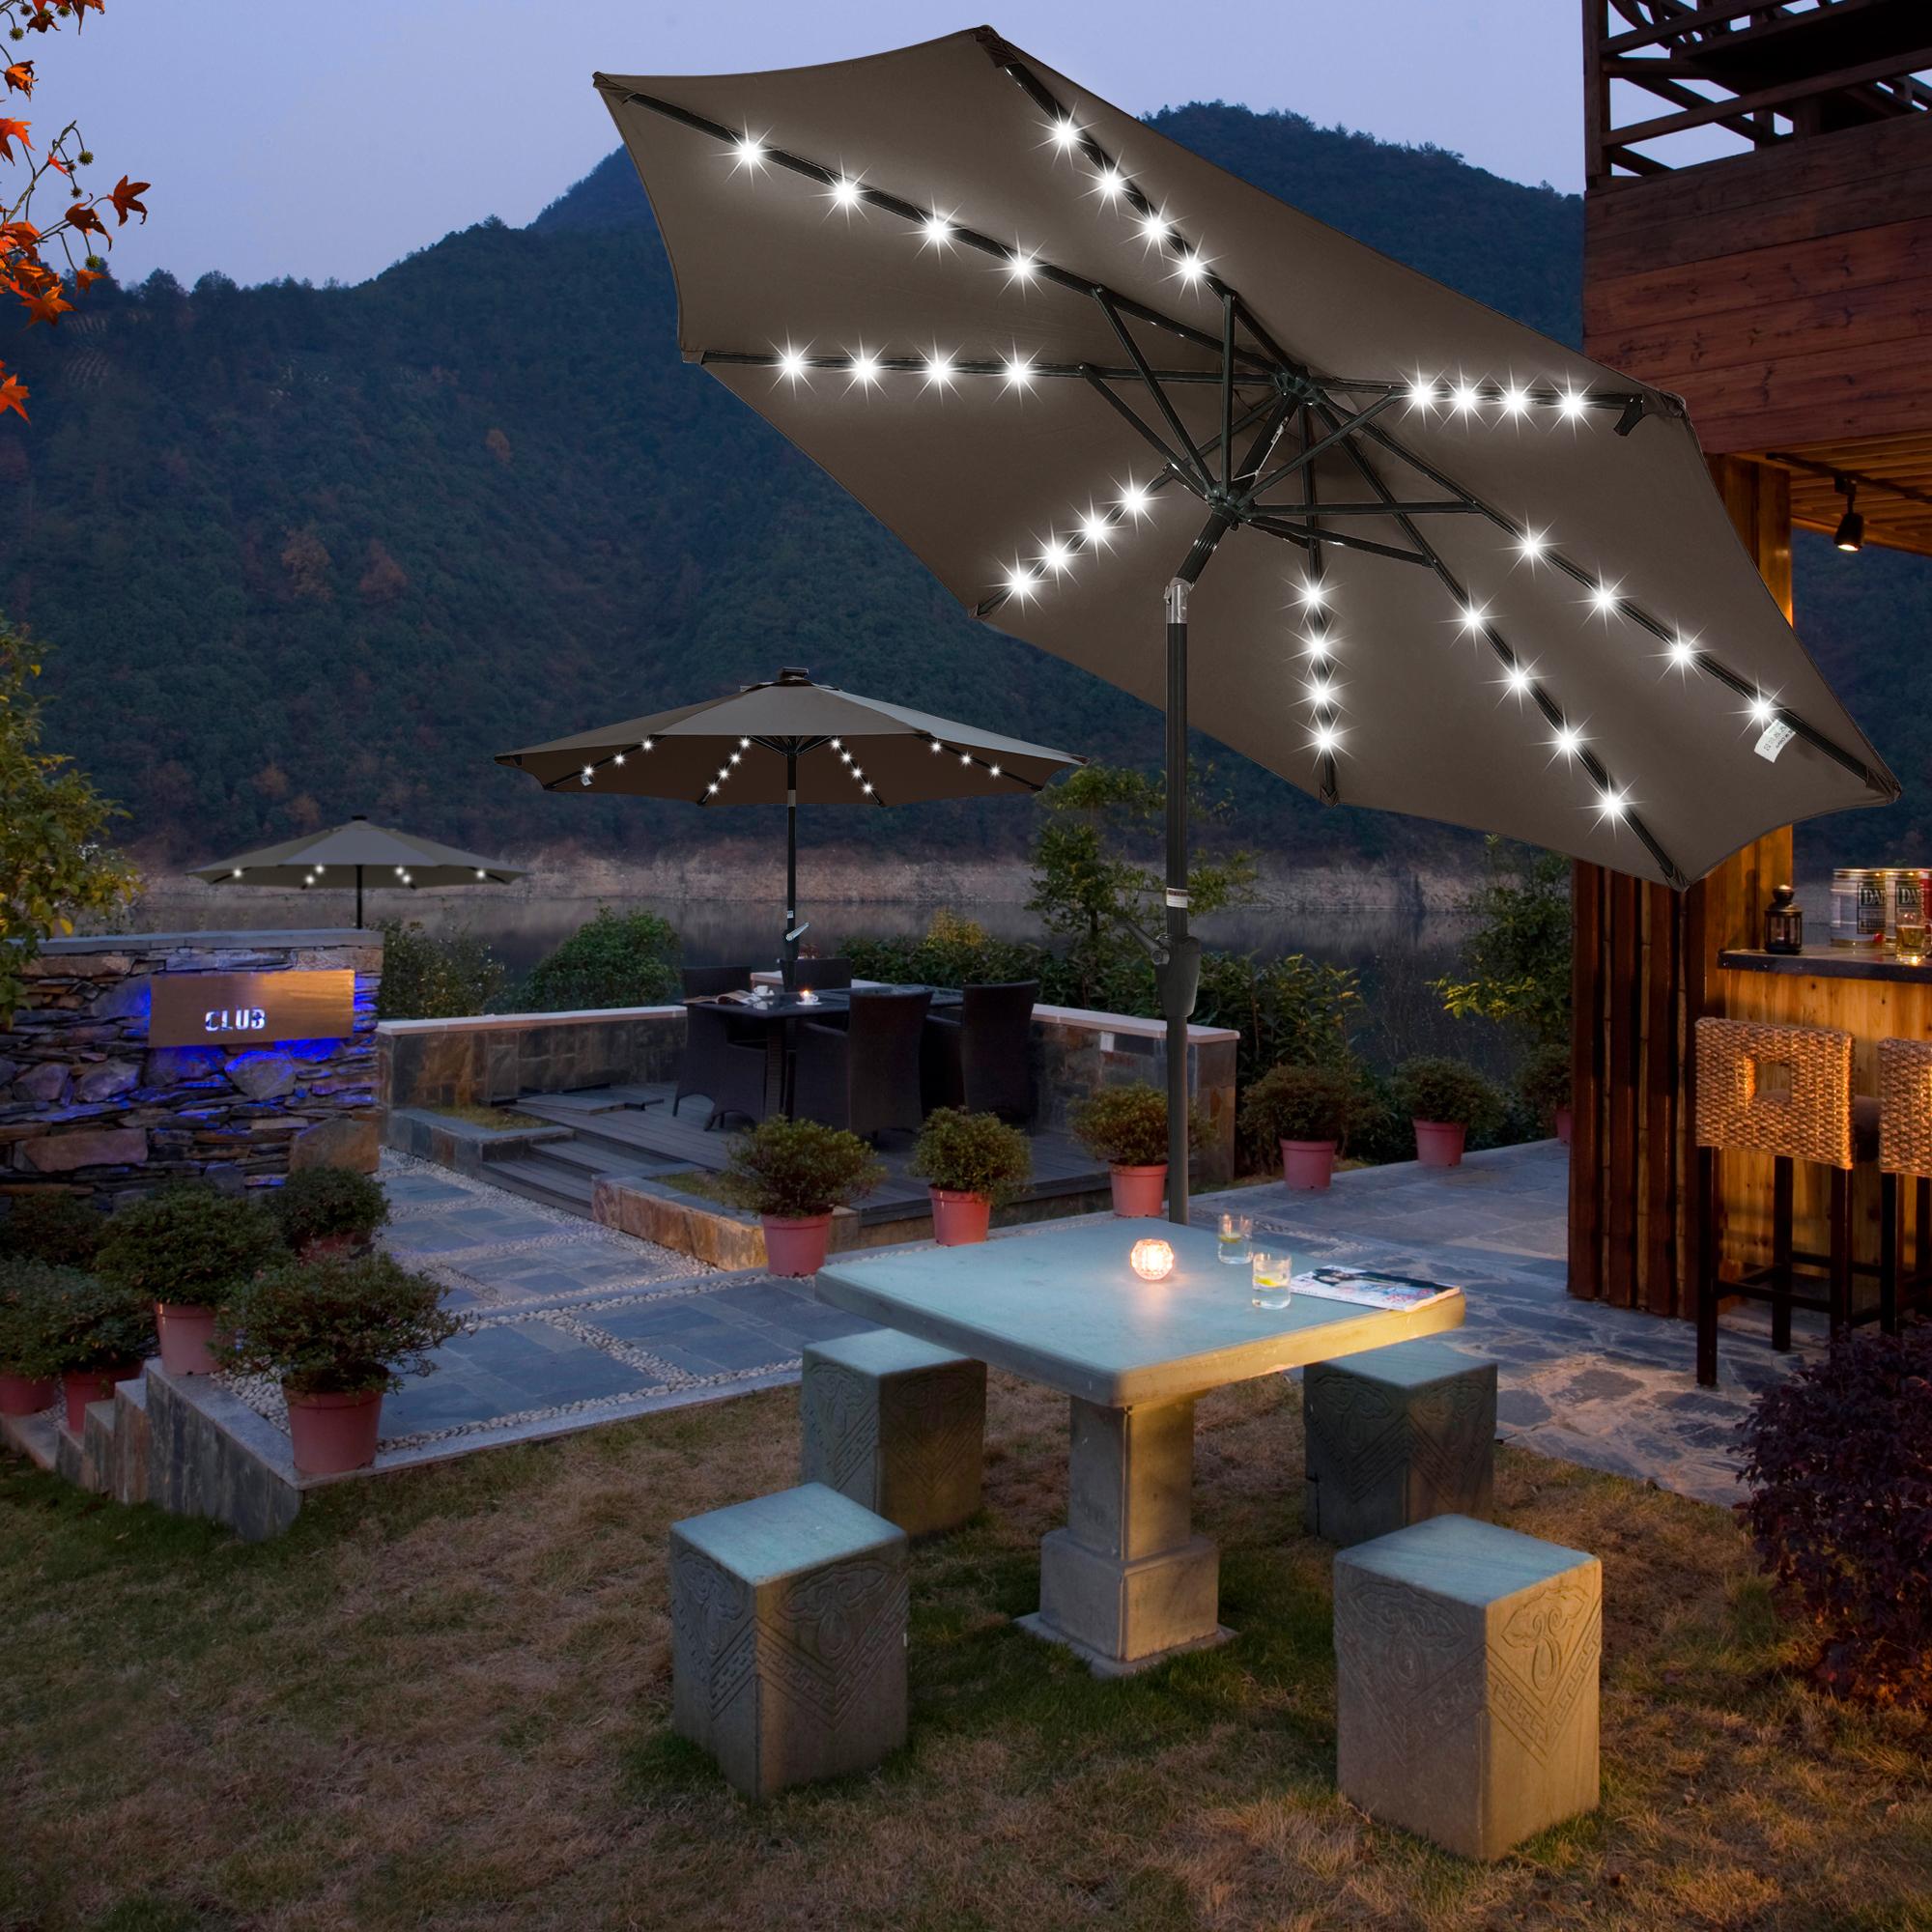 thumbnail 50 - 9' Patio Outdoor Umbrella Solar LED 8 Rib Garden Parasol Yard Deck Table Shade